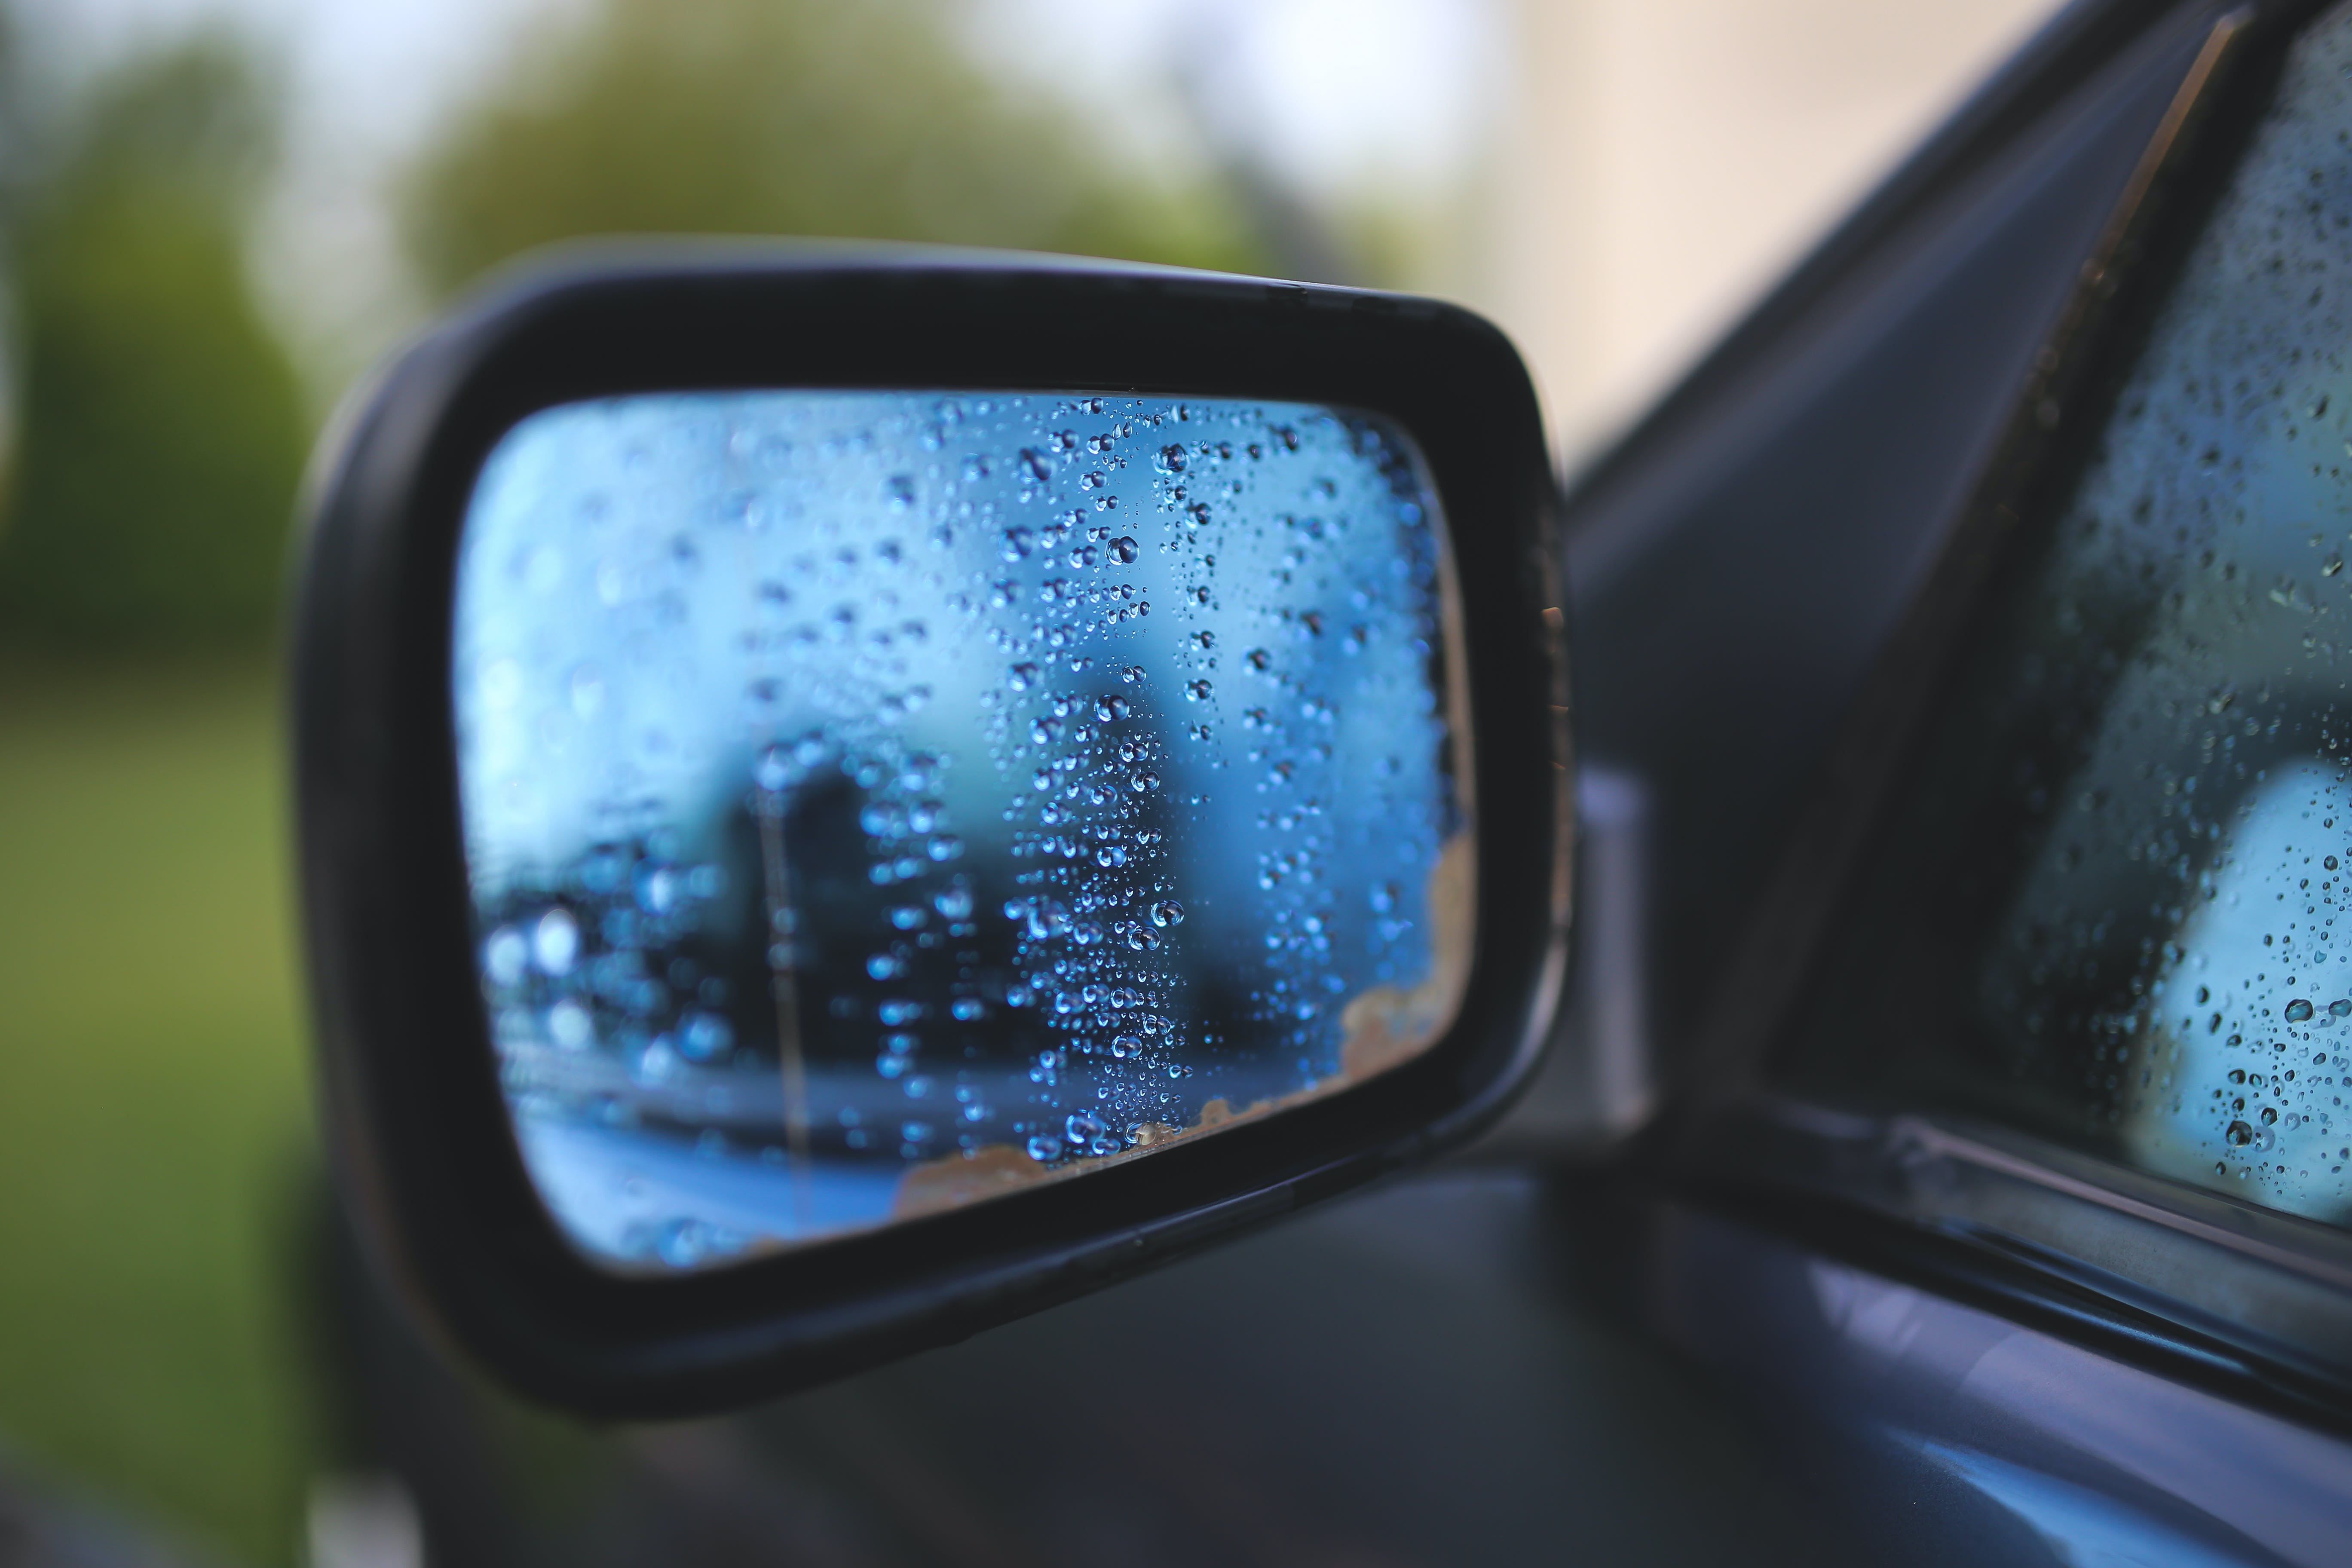 Drops on a car mirror